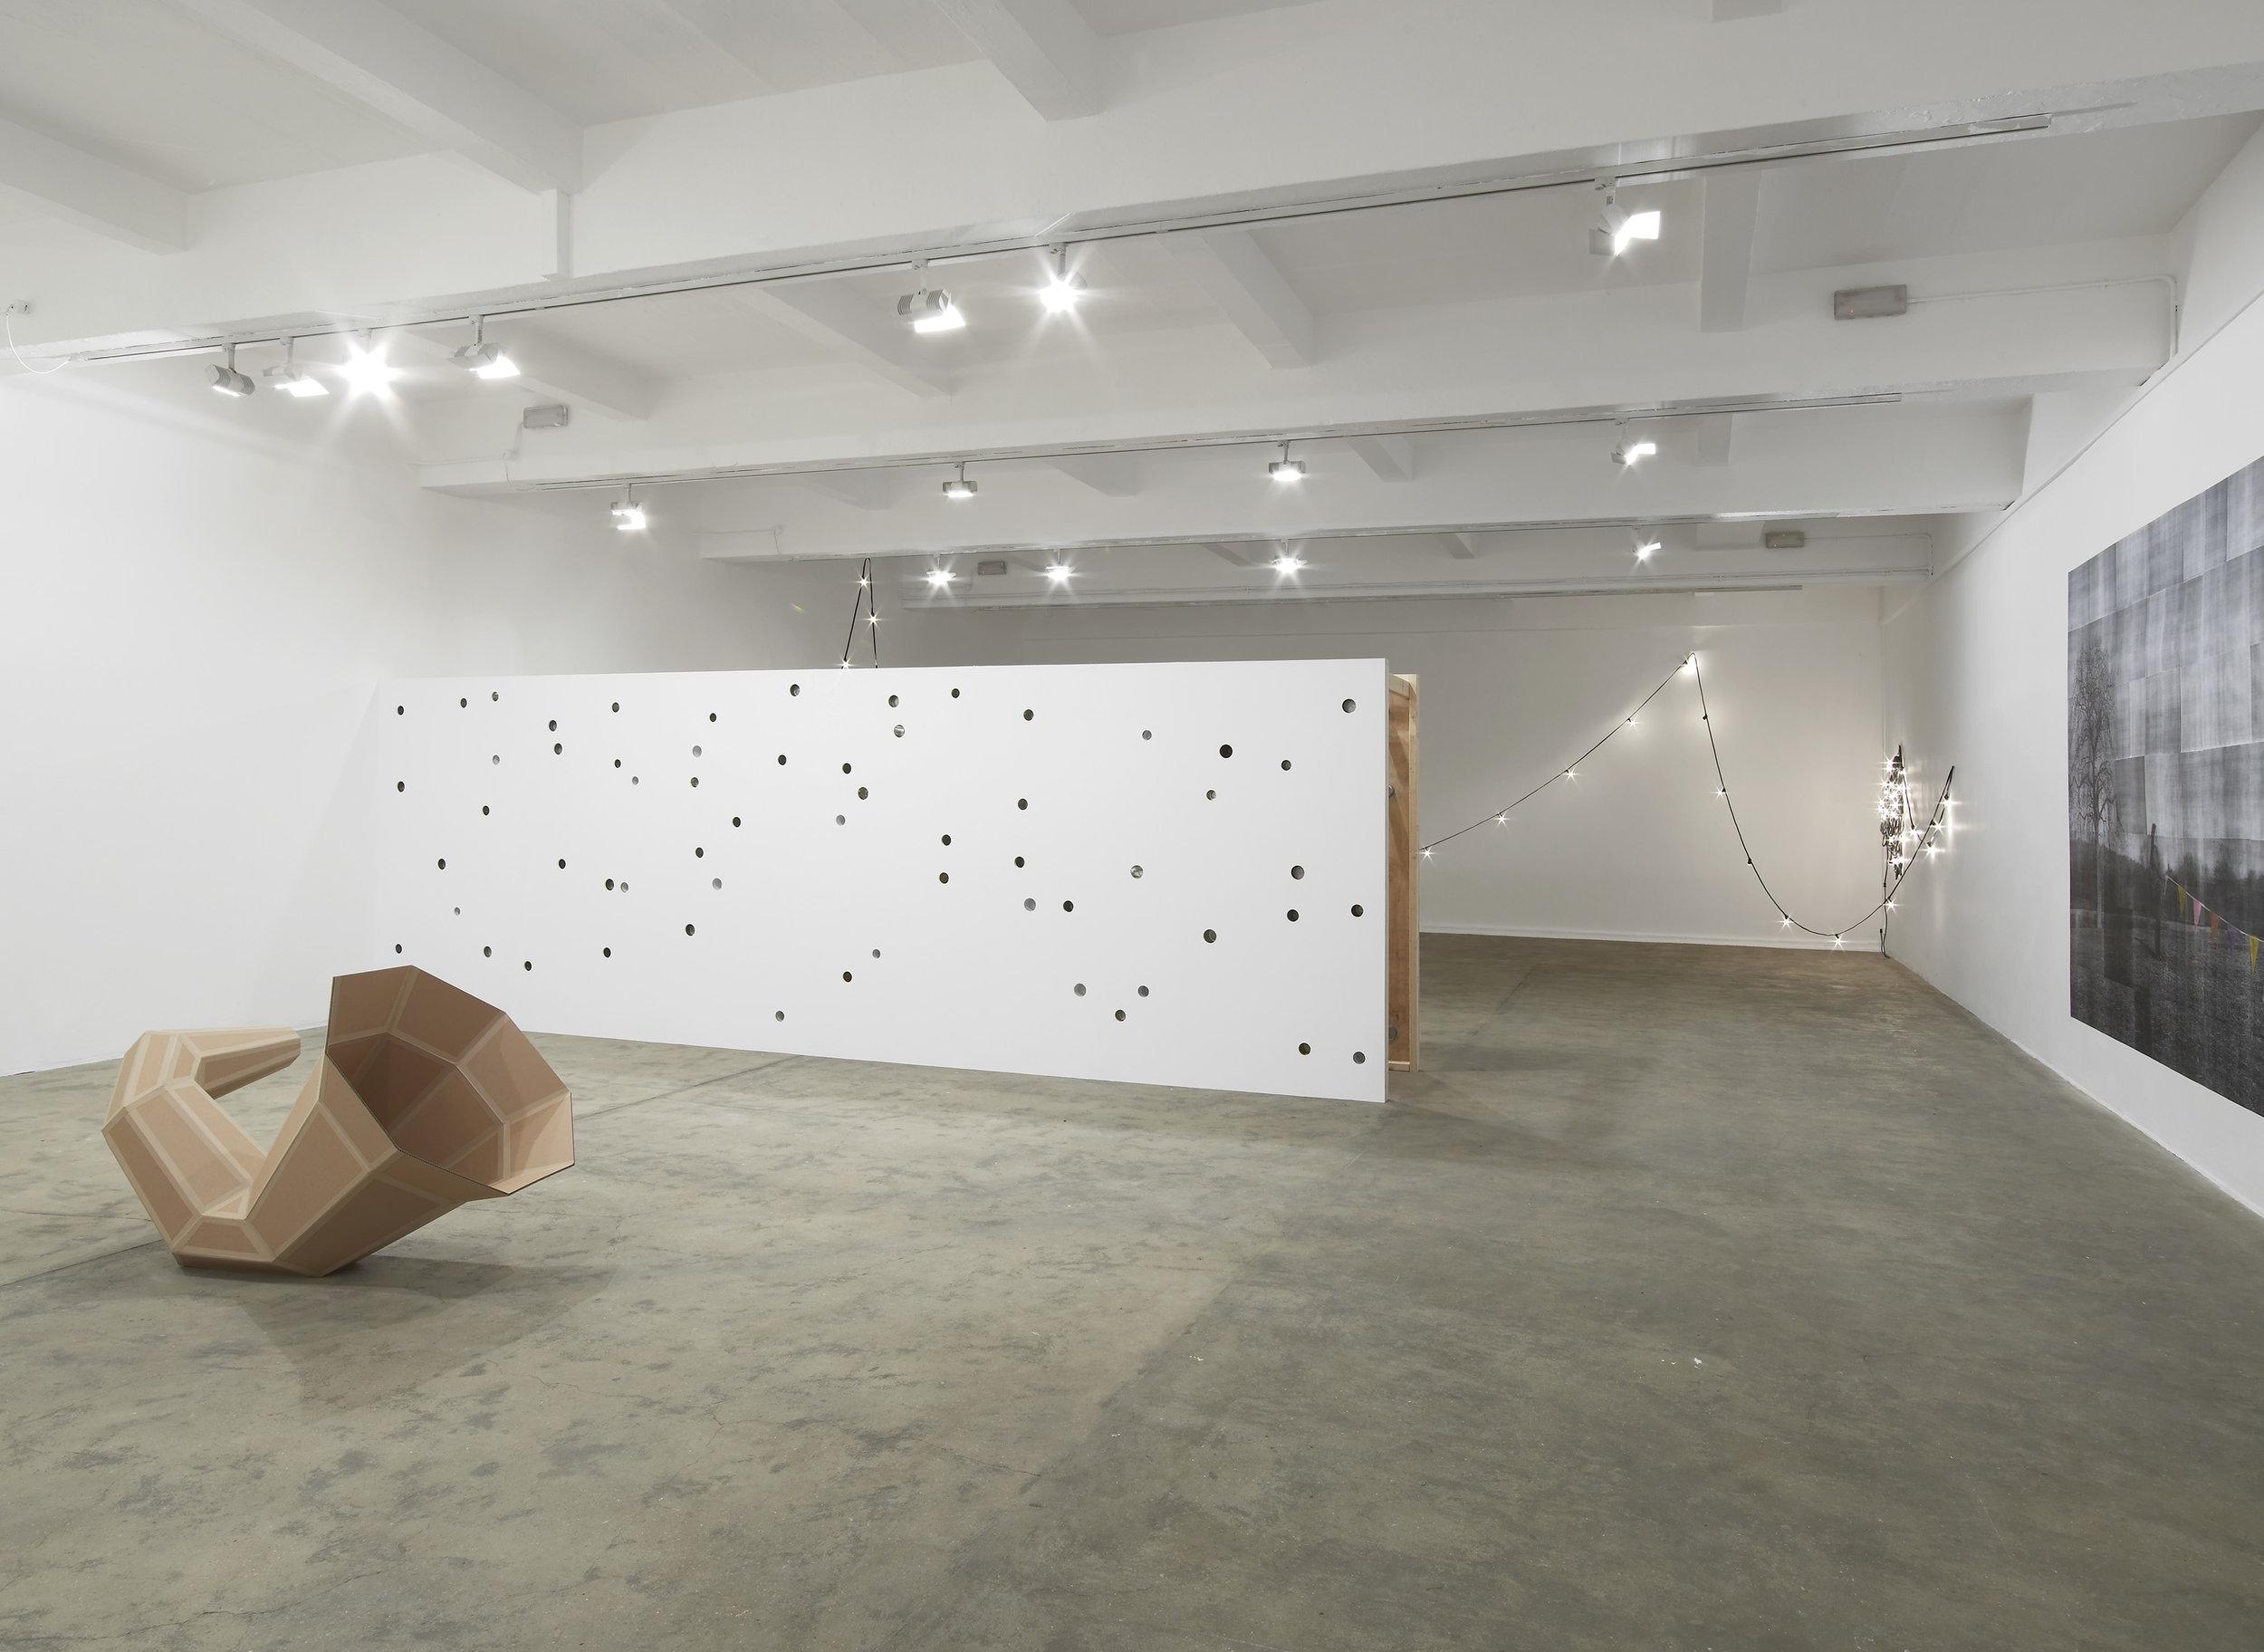 Installation View  Chisenhale Gallery, London, UK  2012